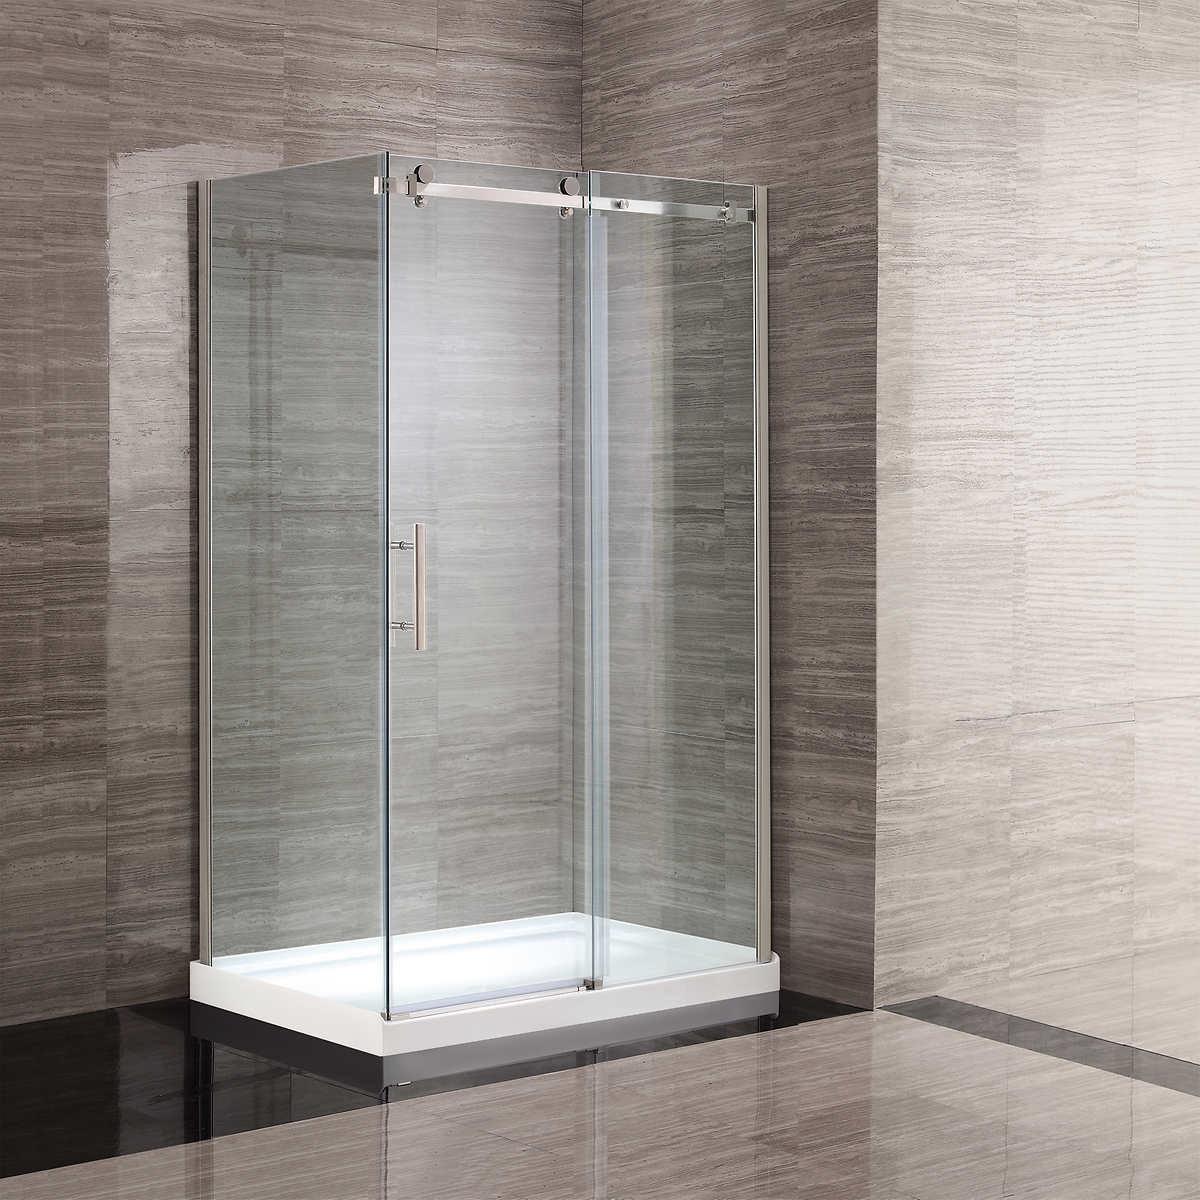 Ove Decors Kelsey 48 Shower